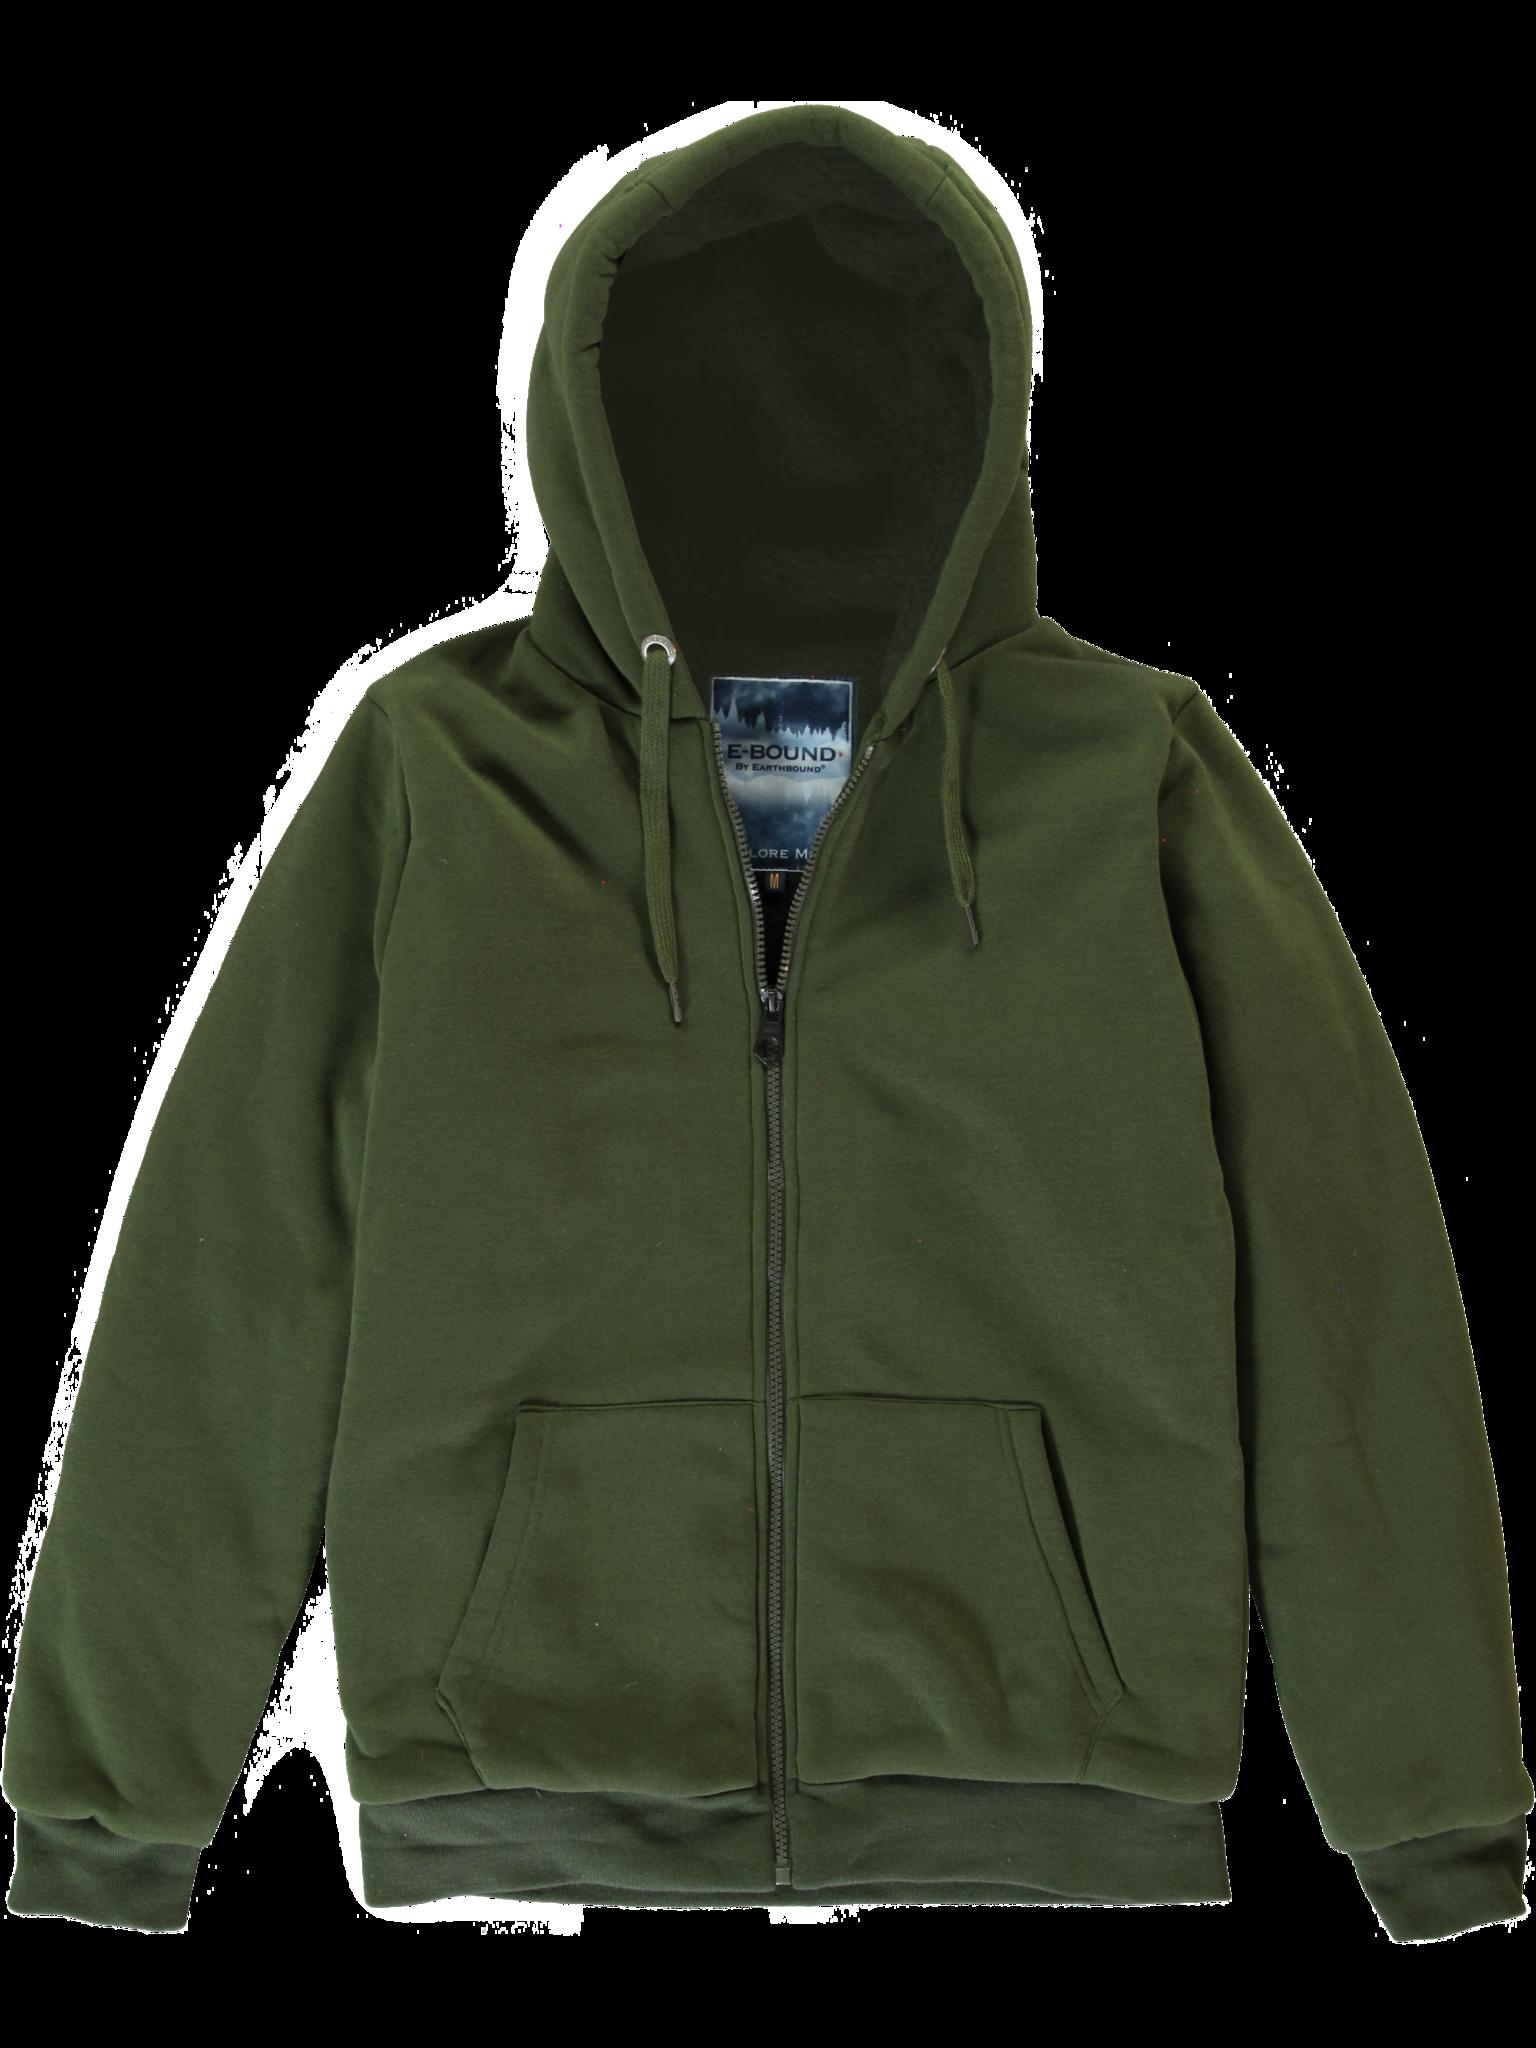 All Brands | Winterproducts Men | Cardigan Sweater | 20 pcs/box